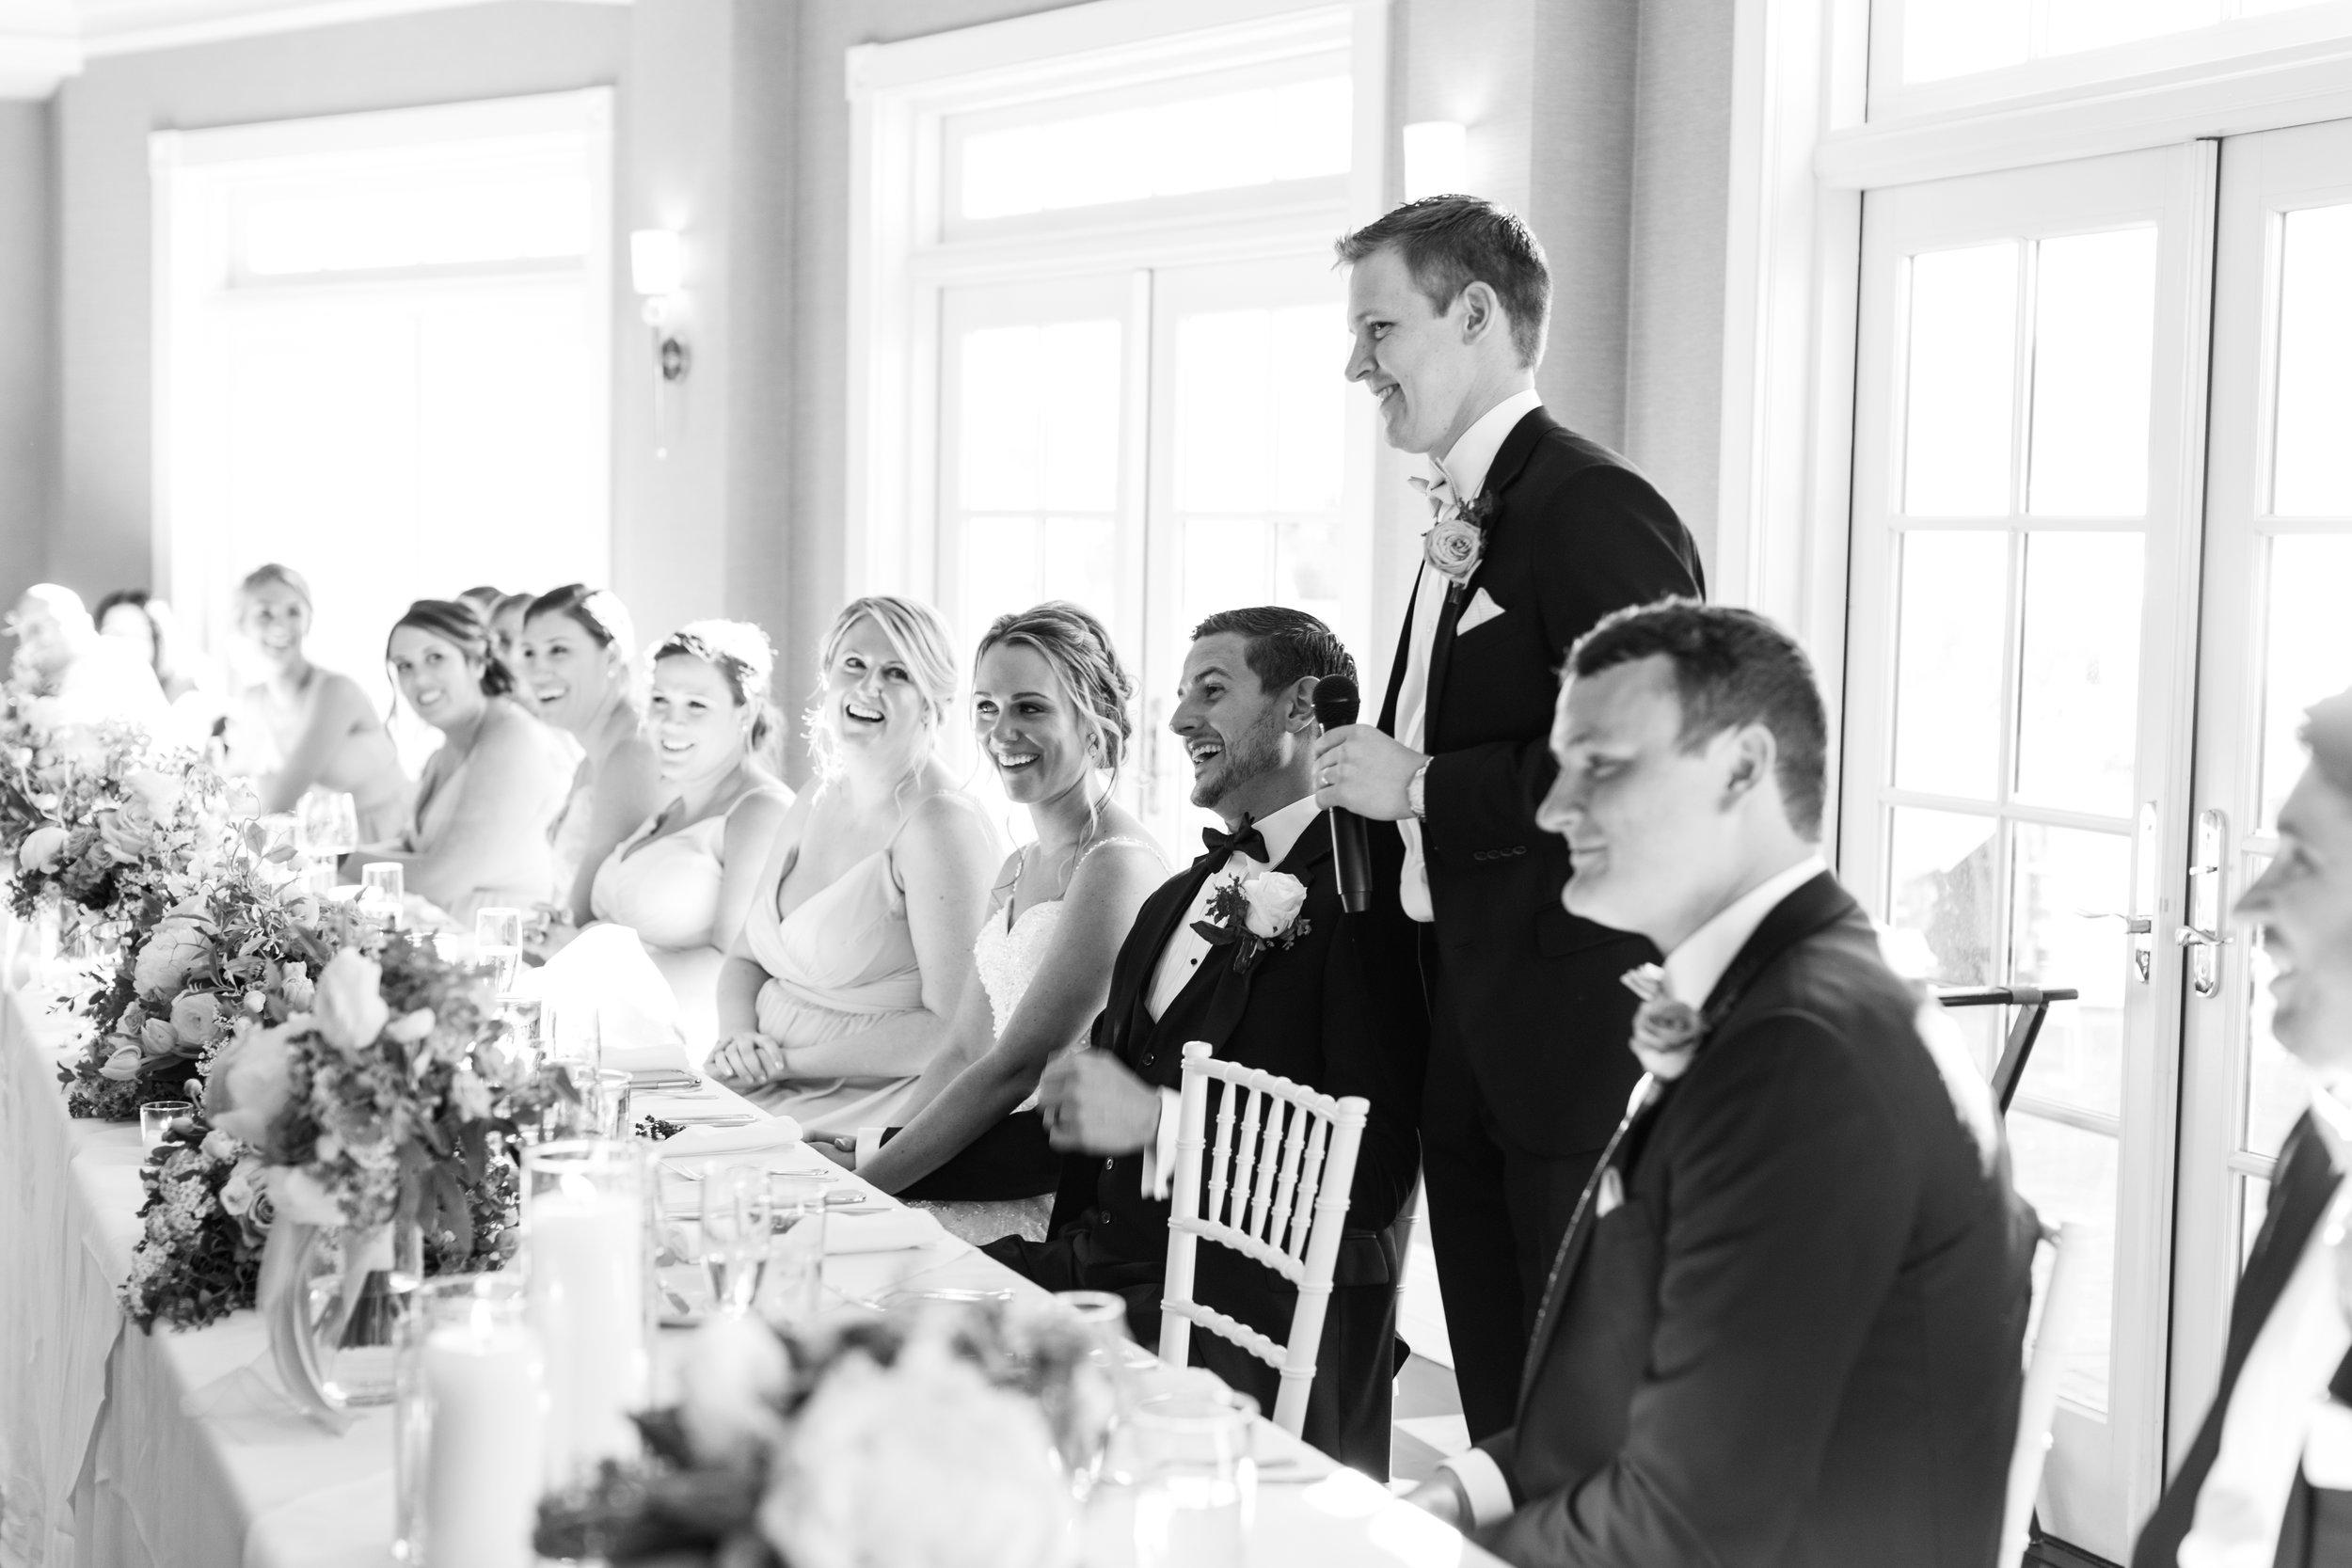 Noss+Wedding+Reception-56.jpg